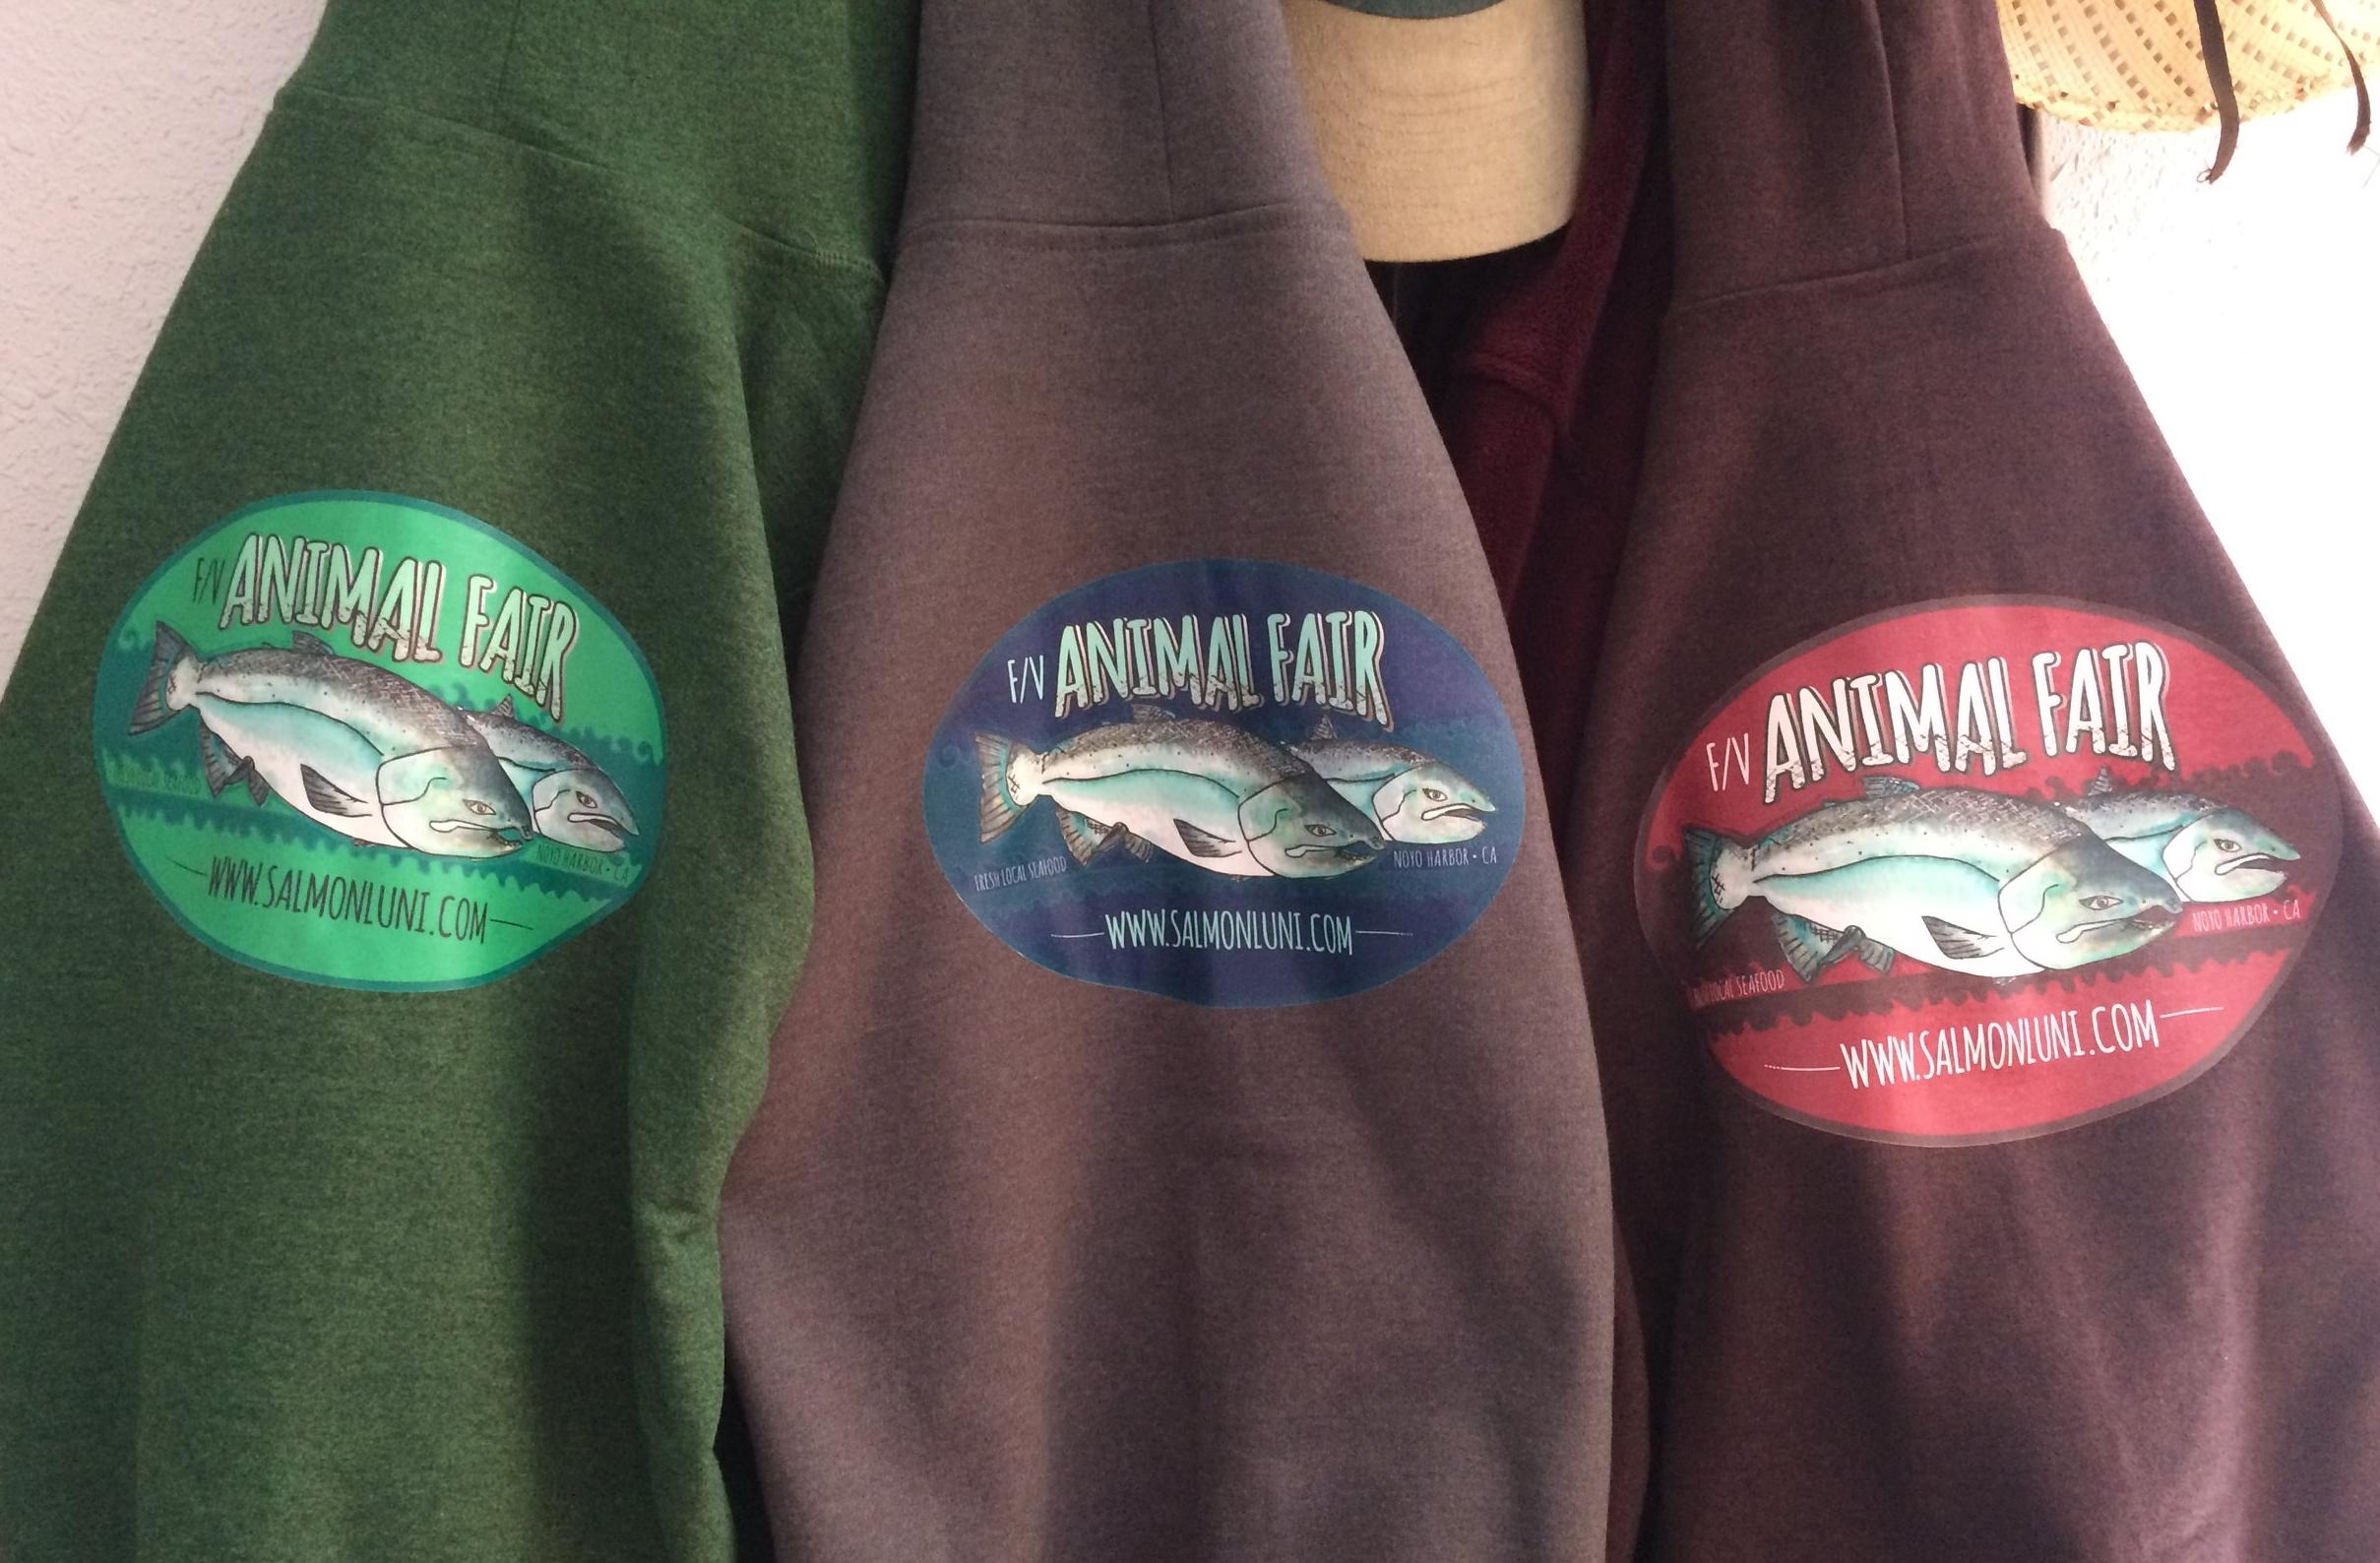 Animal Fair hoodies will be available soon!